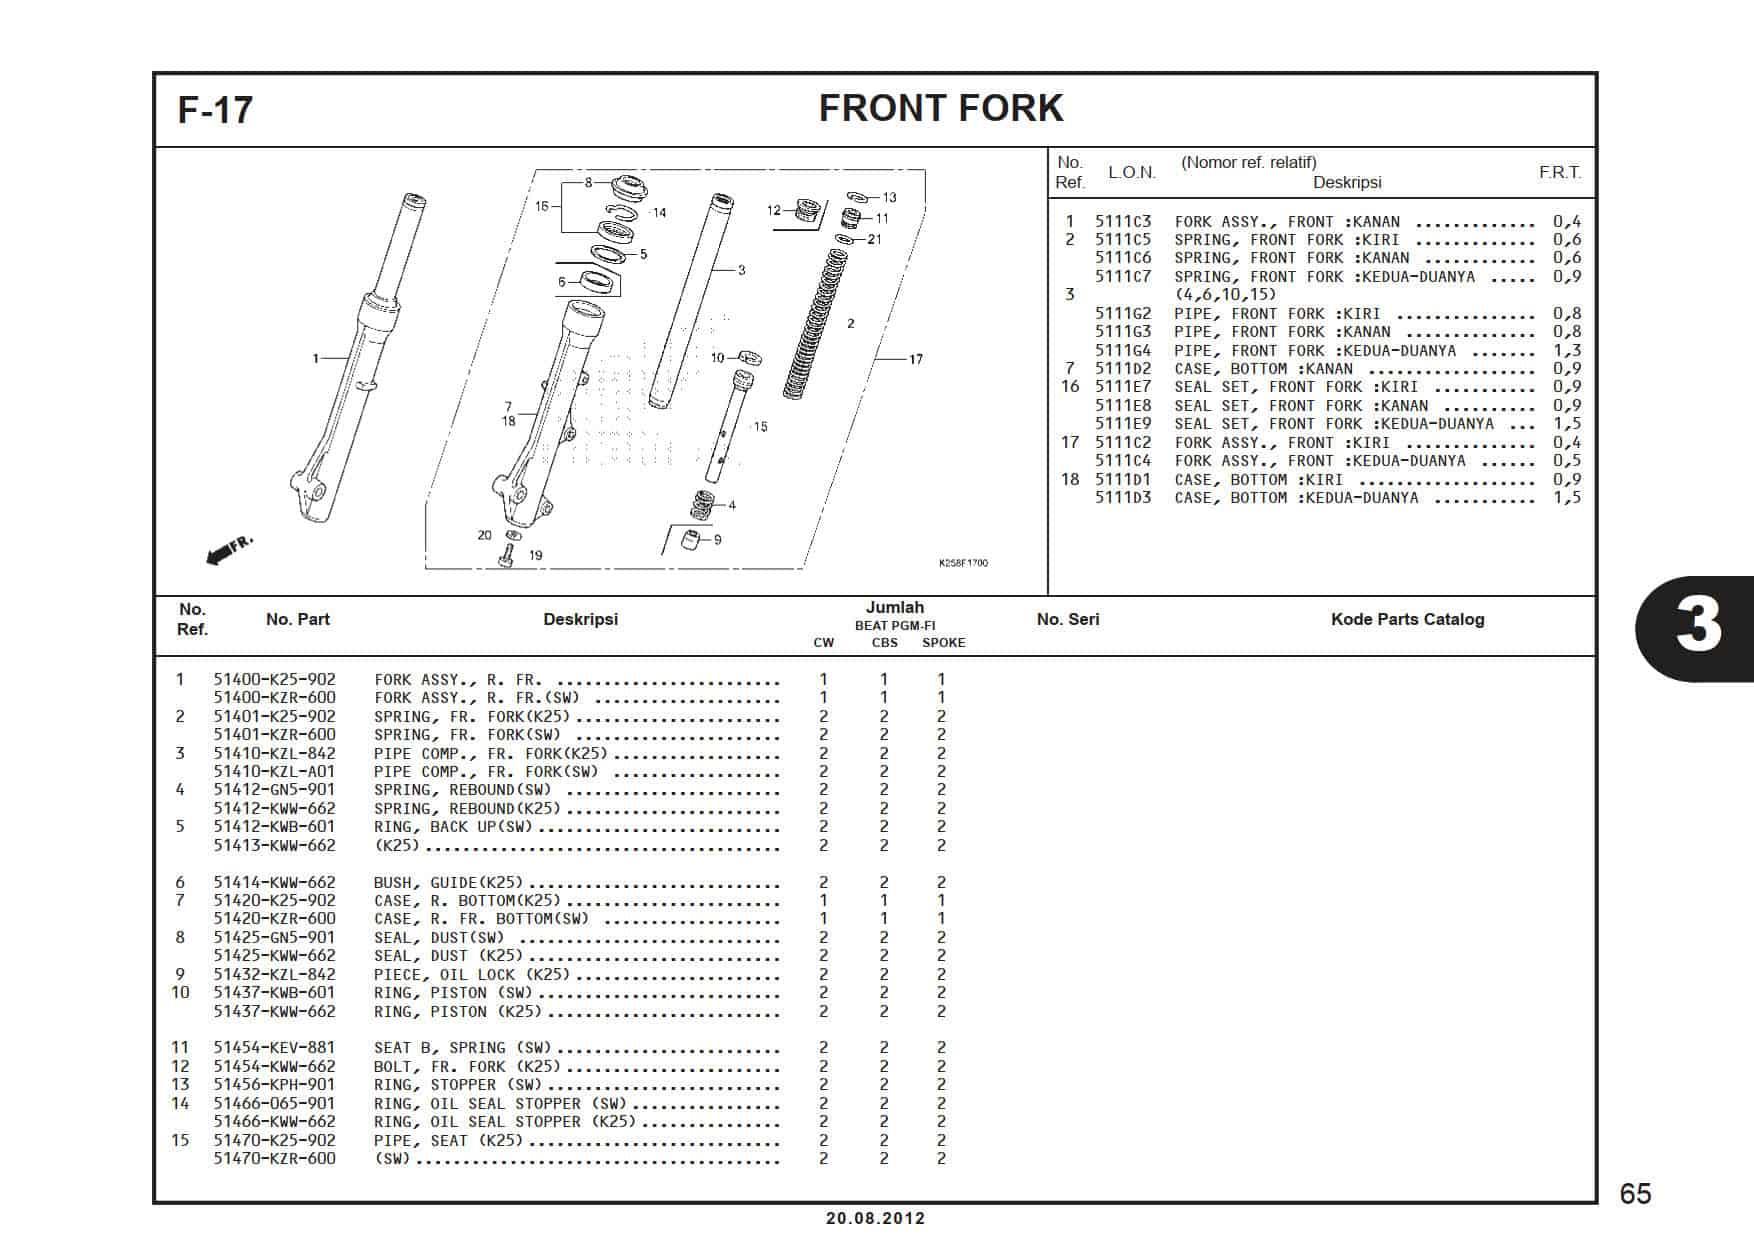 F-17 Front Fork